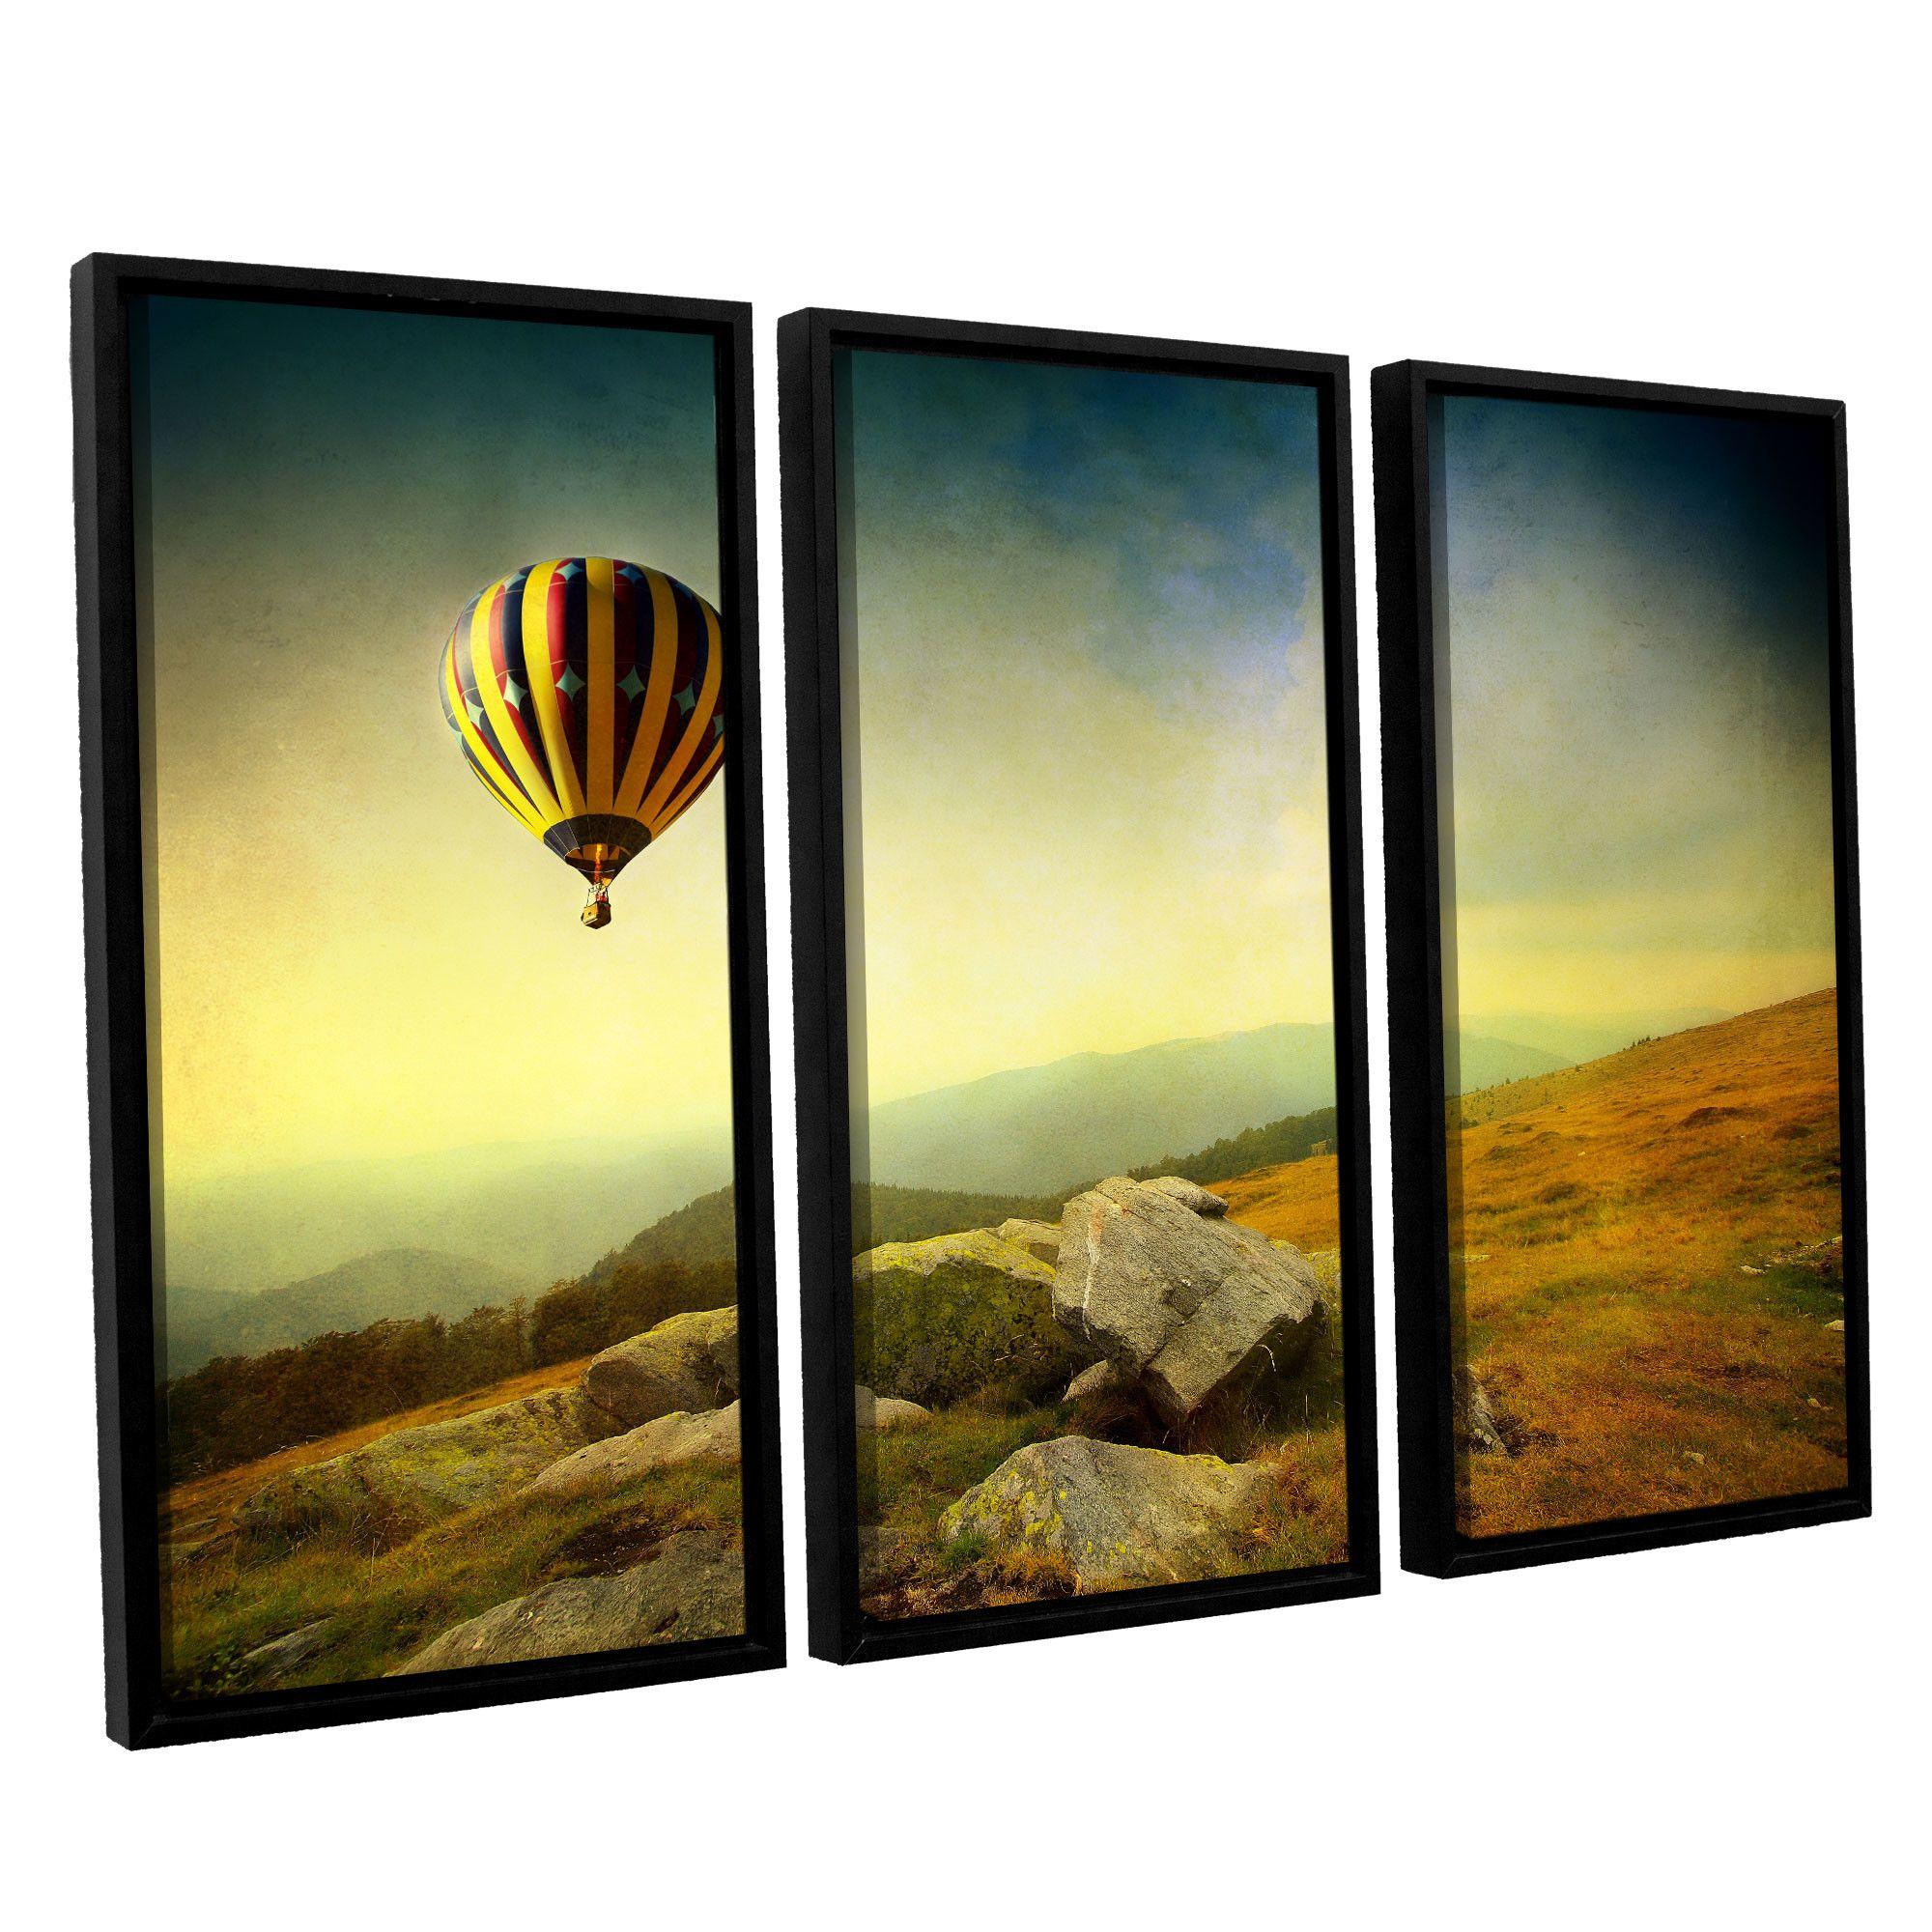 Keys to Imagination III\' by Dragos Dumitrascu 3 Piece Framed ...